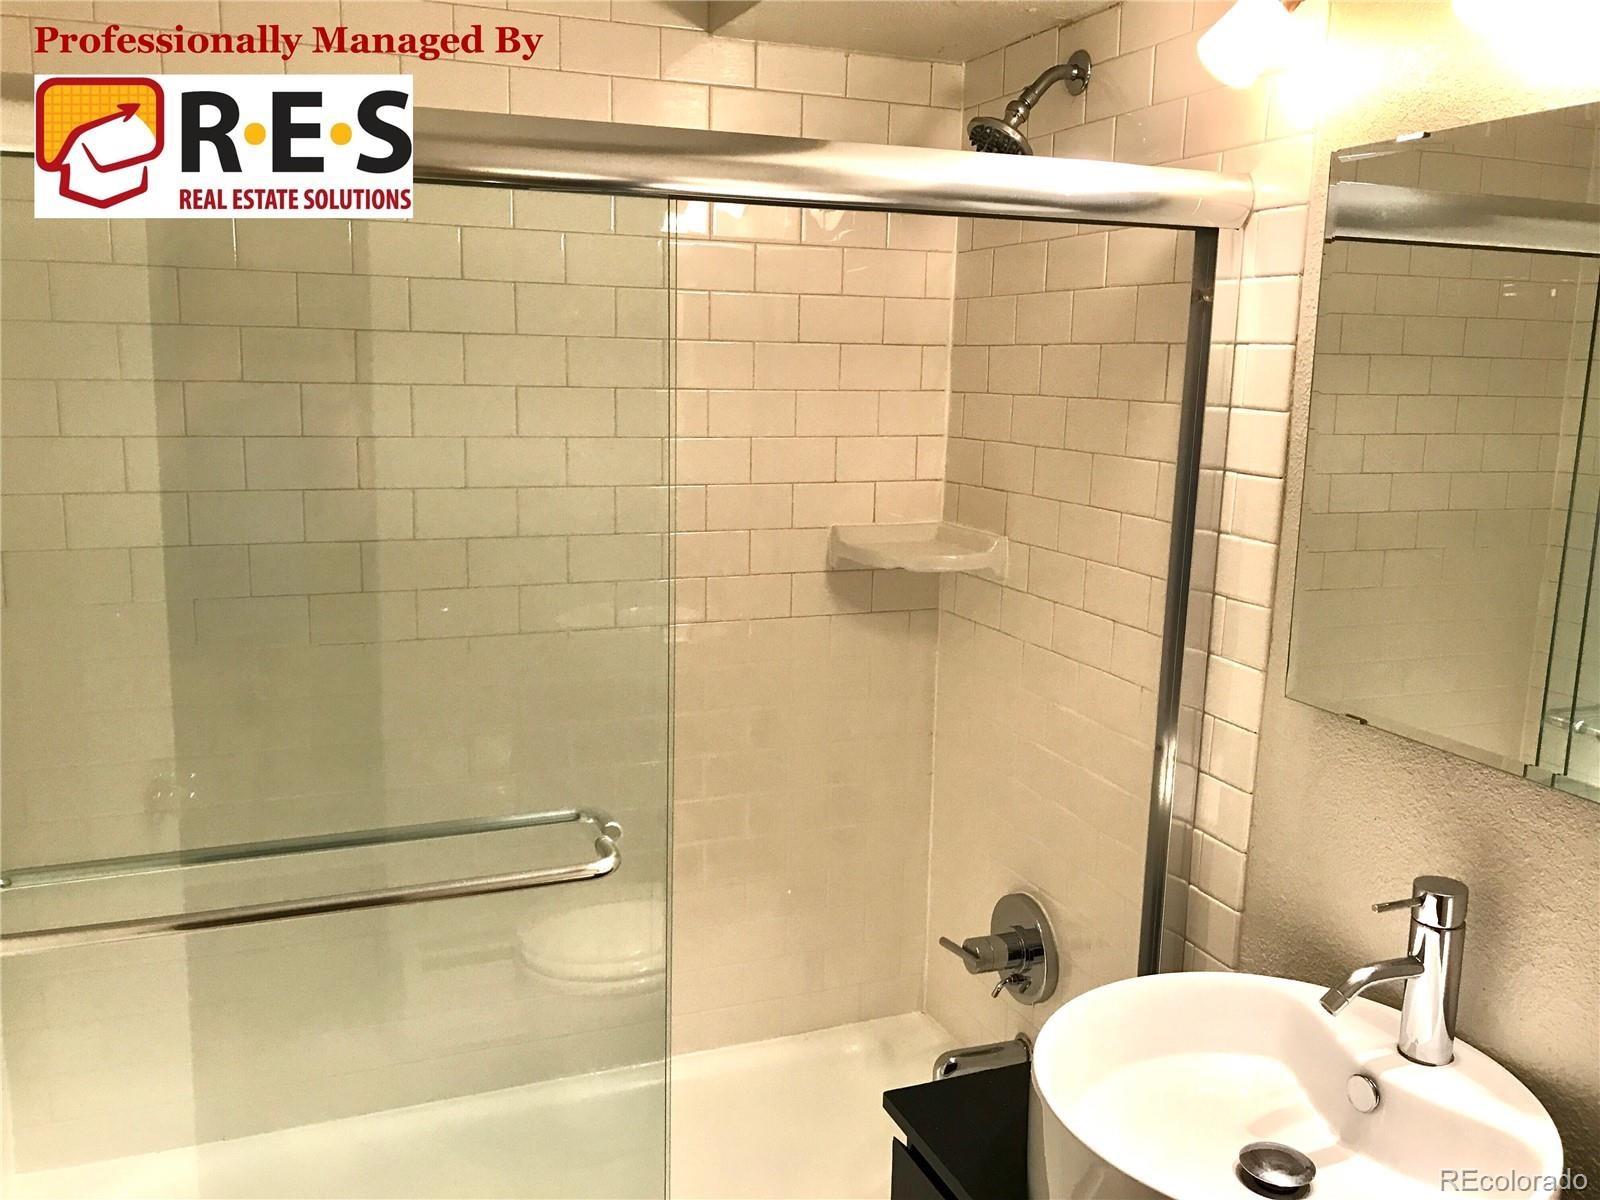 MLS# 9817838 - 10 - 75 N Emerson Street #103, Denver, CO 80218